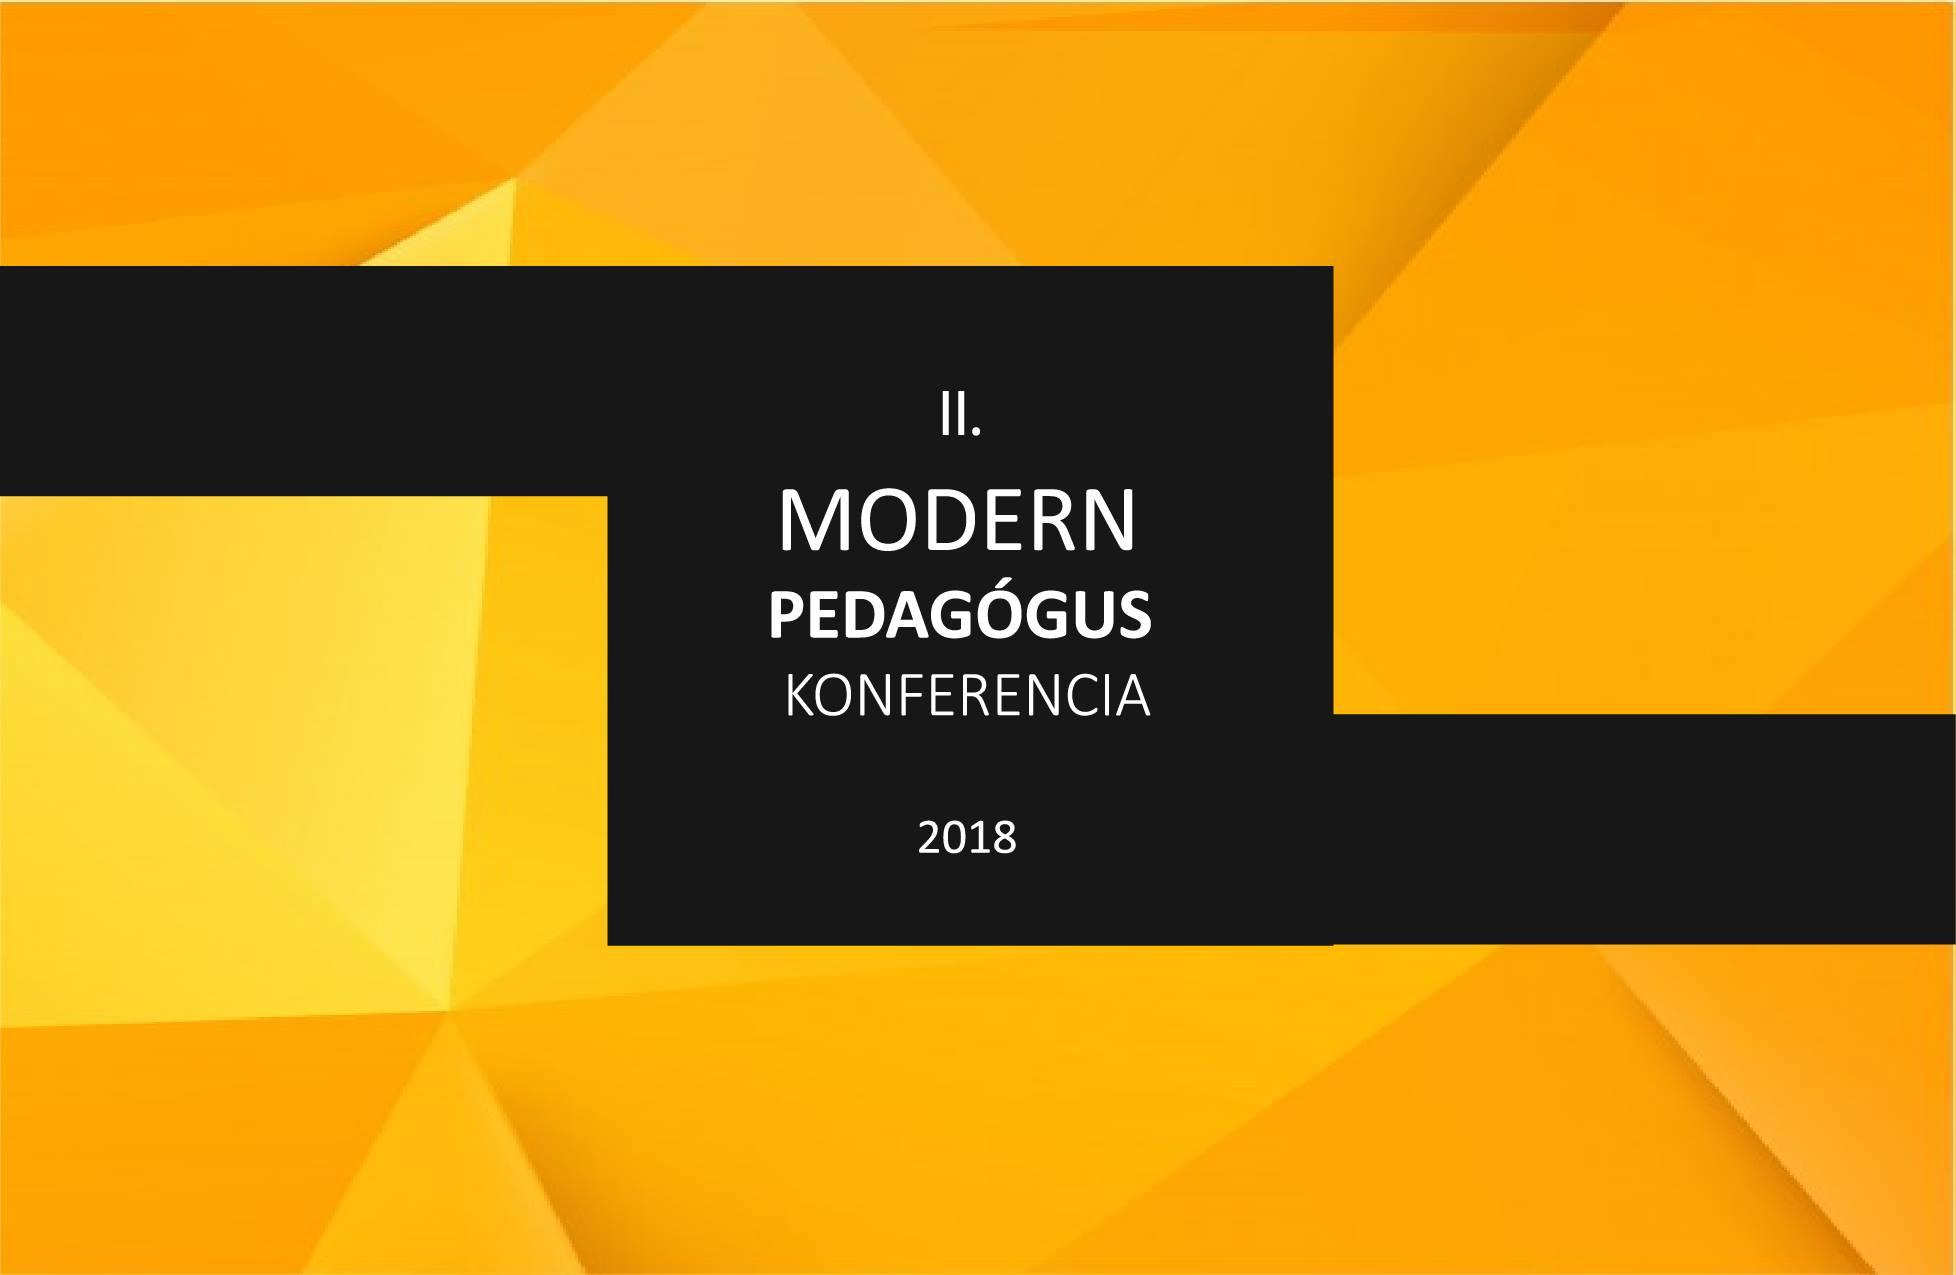 Modern Pedagógus Konferencia az Európa Hajón